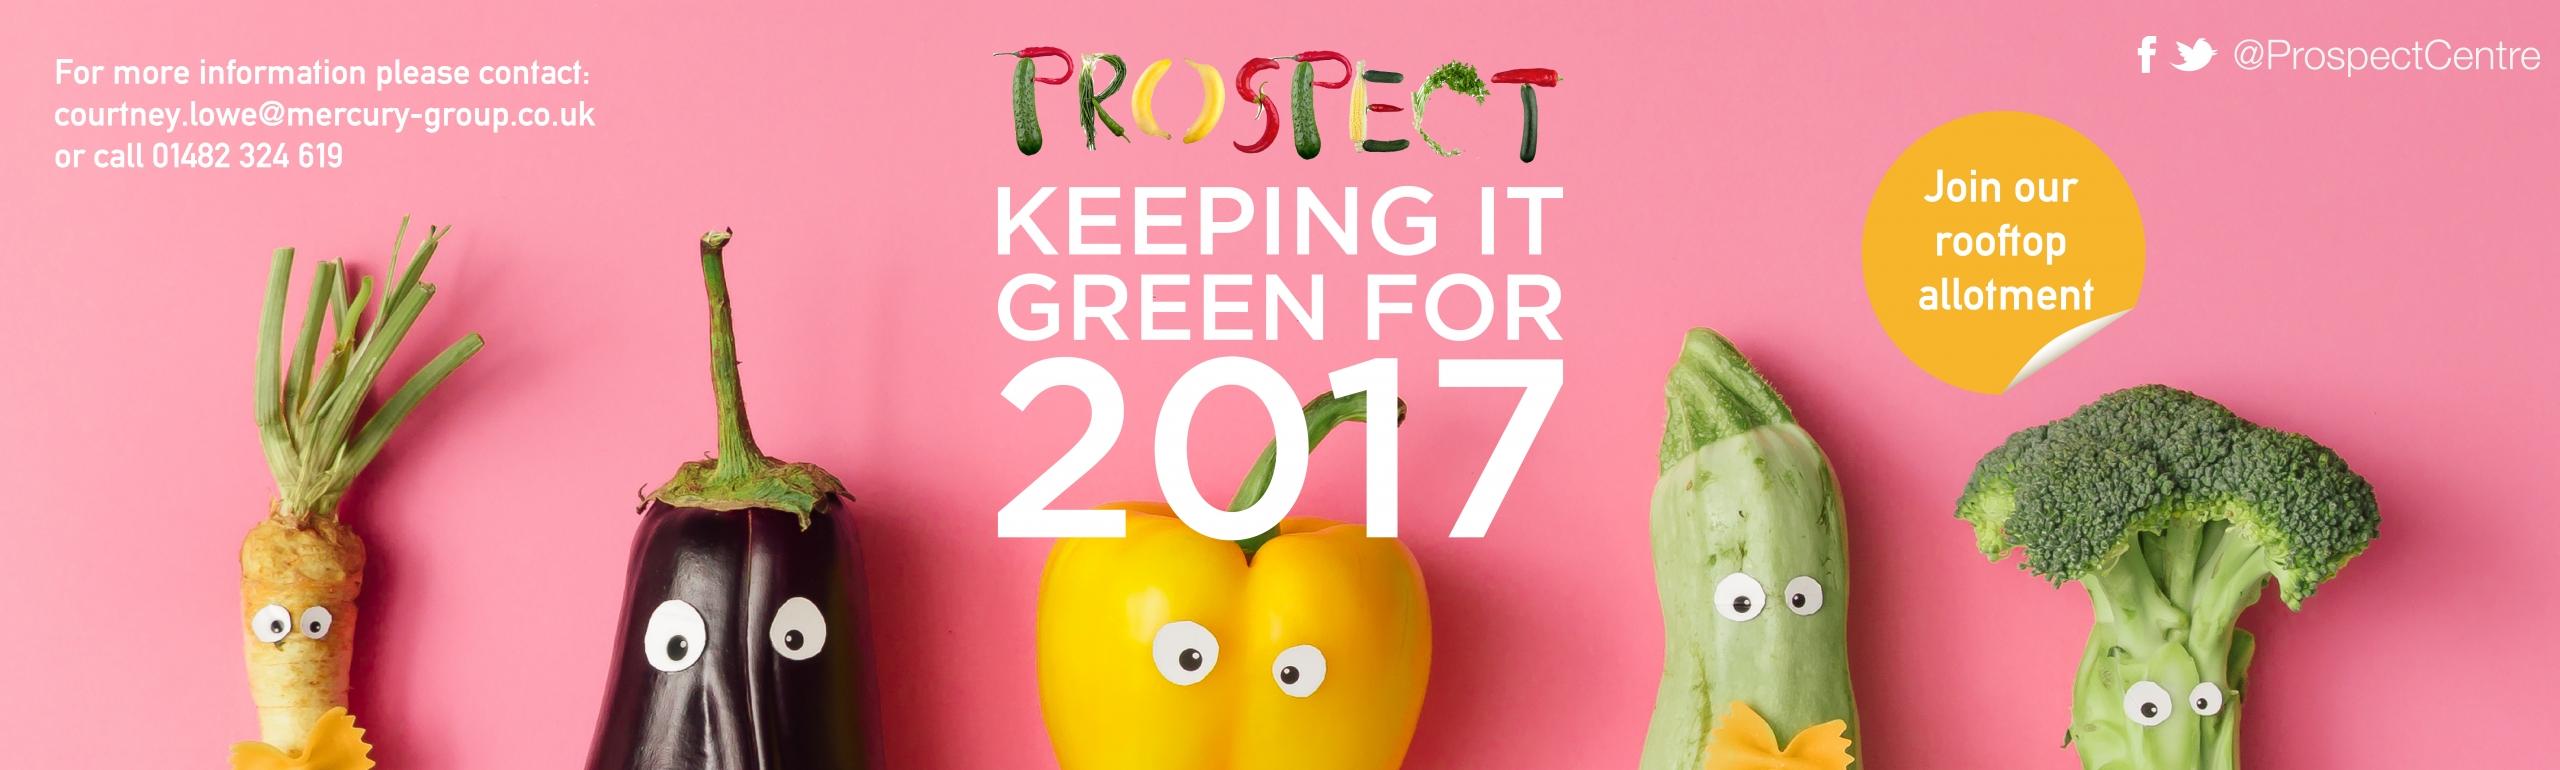 keeping it green slider_RESIZE_newwebsite